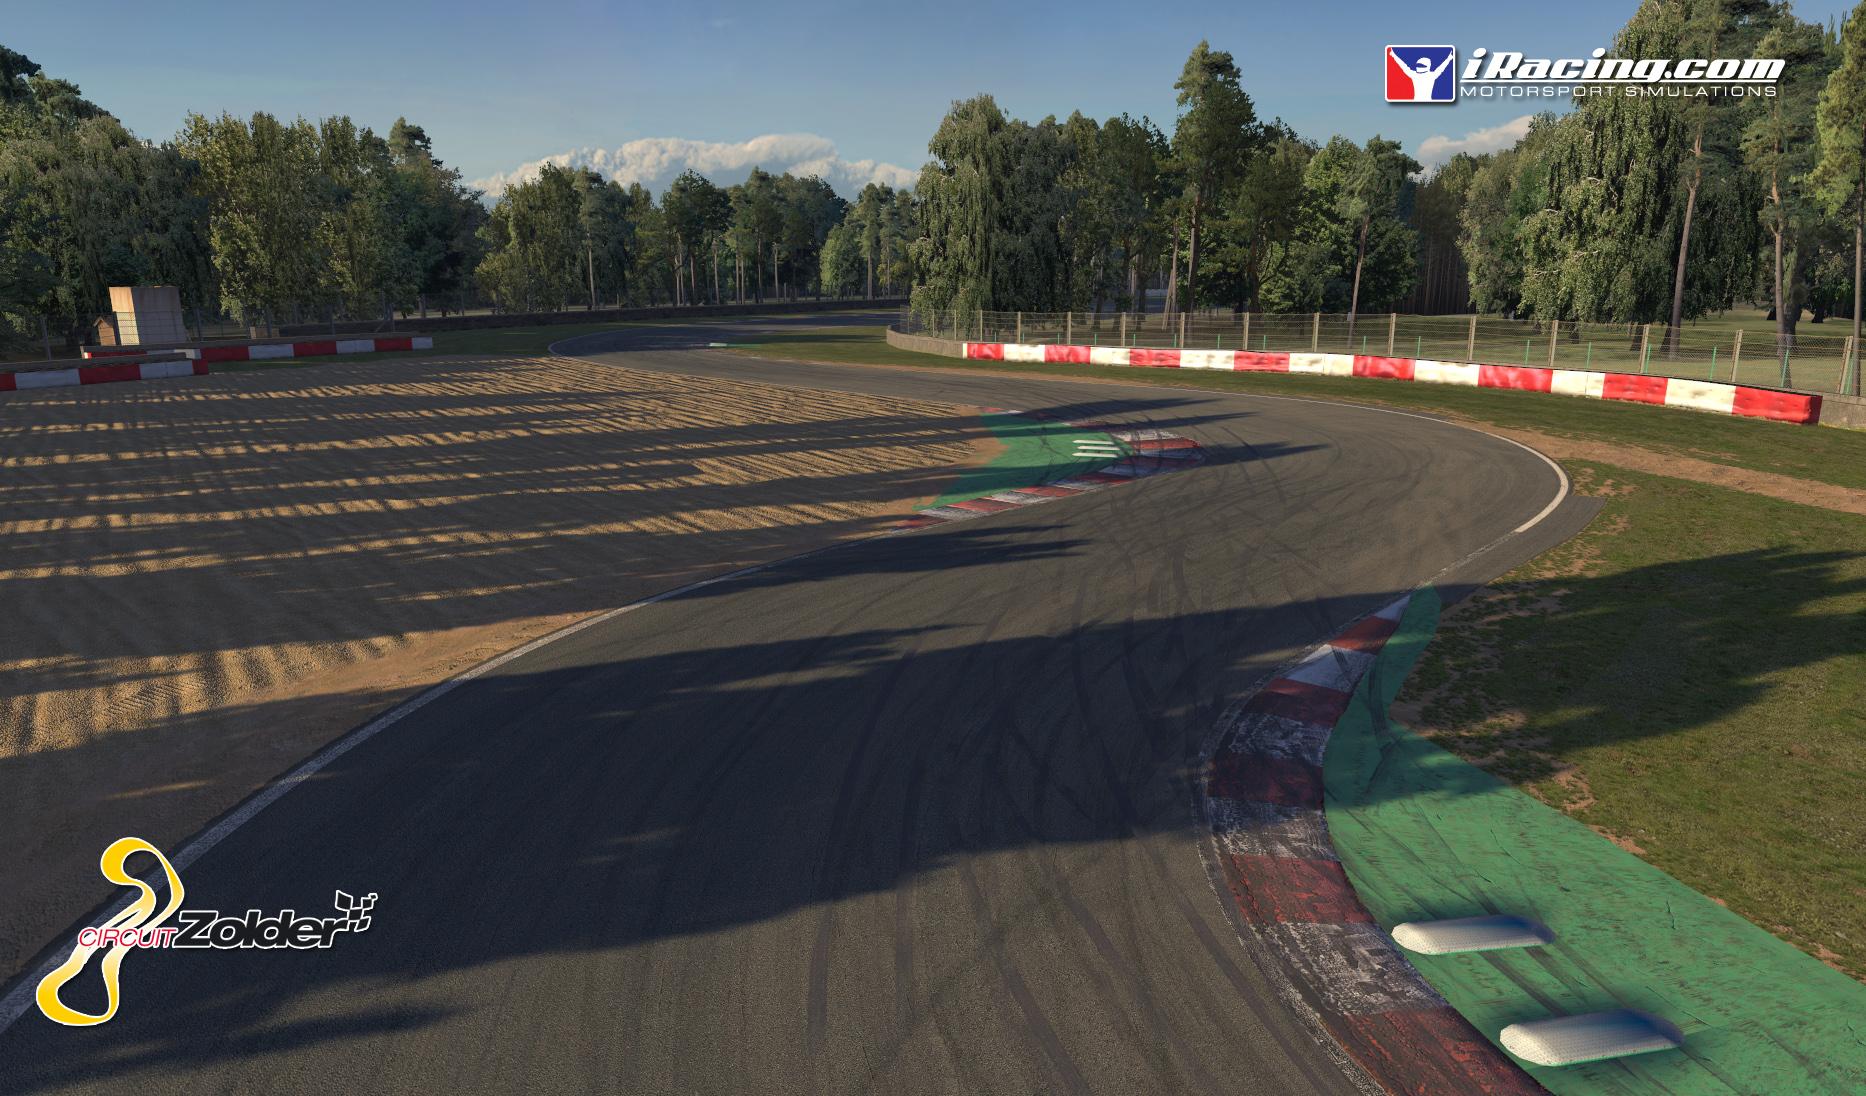 Circuito Zolder : Circuit zolder iracing motorsport simulations